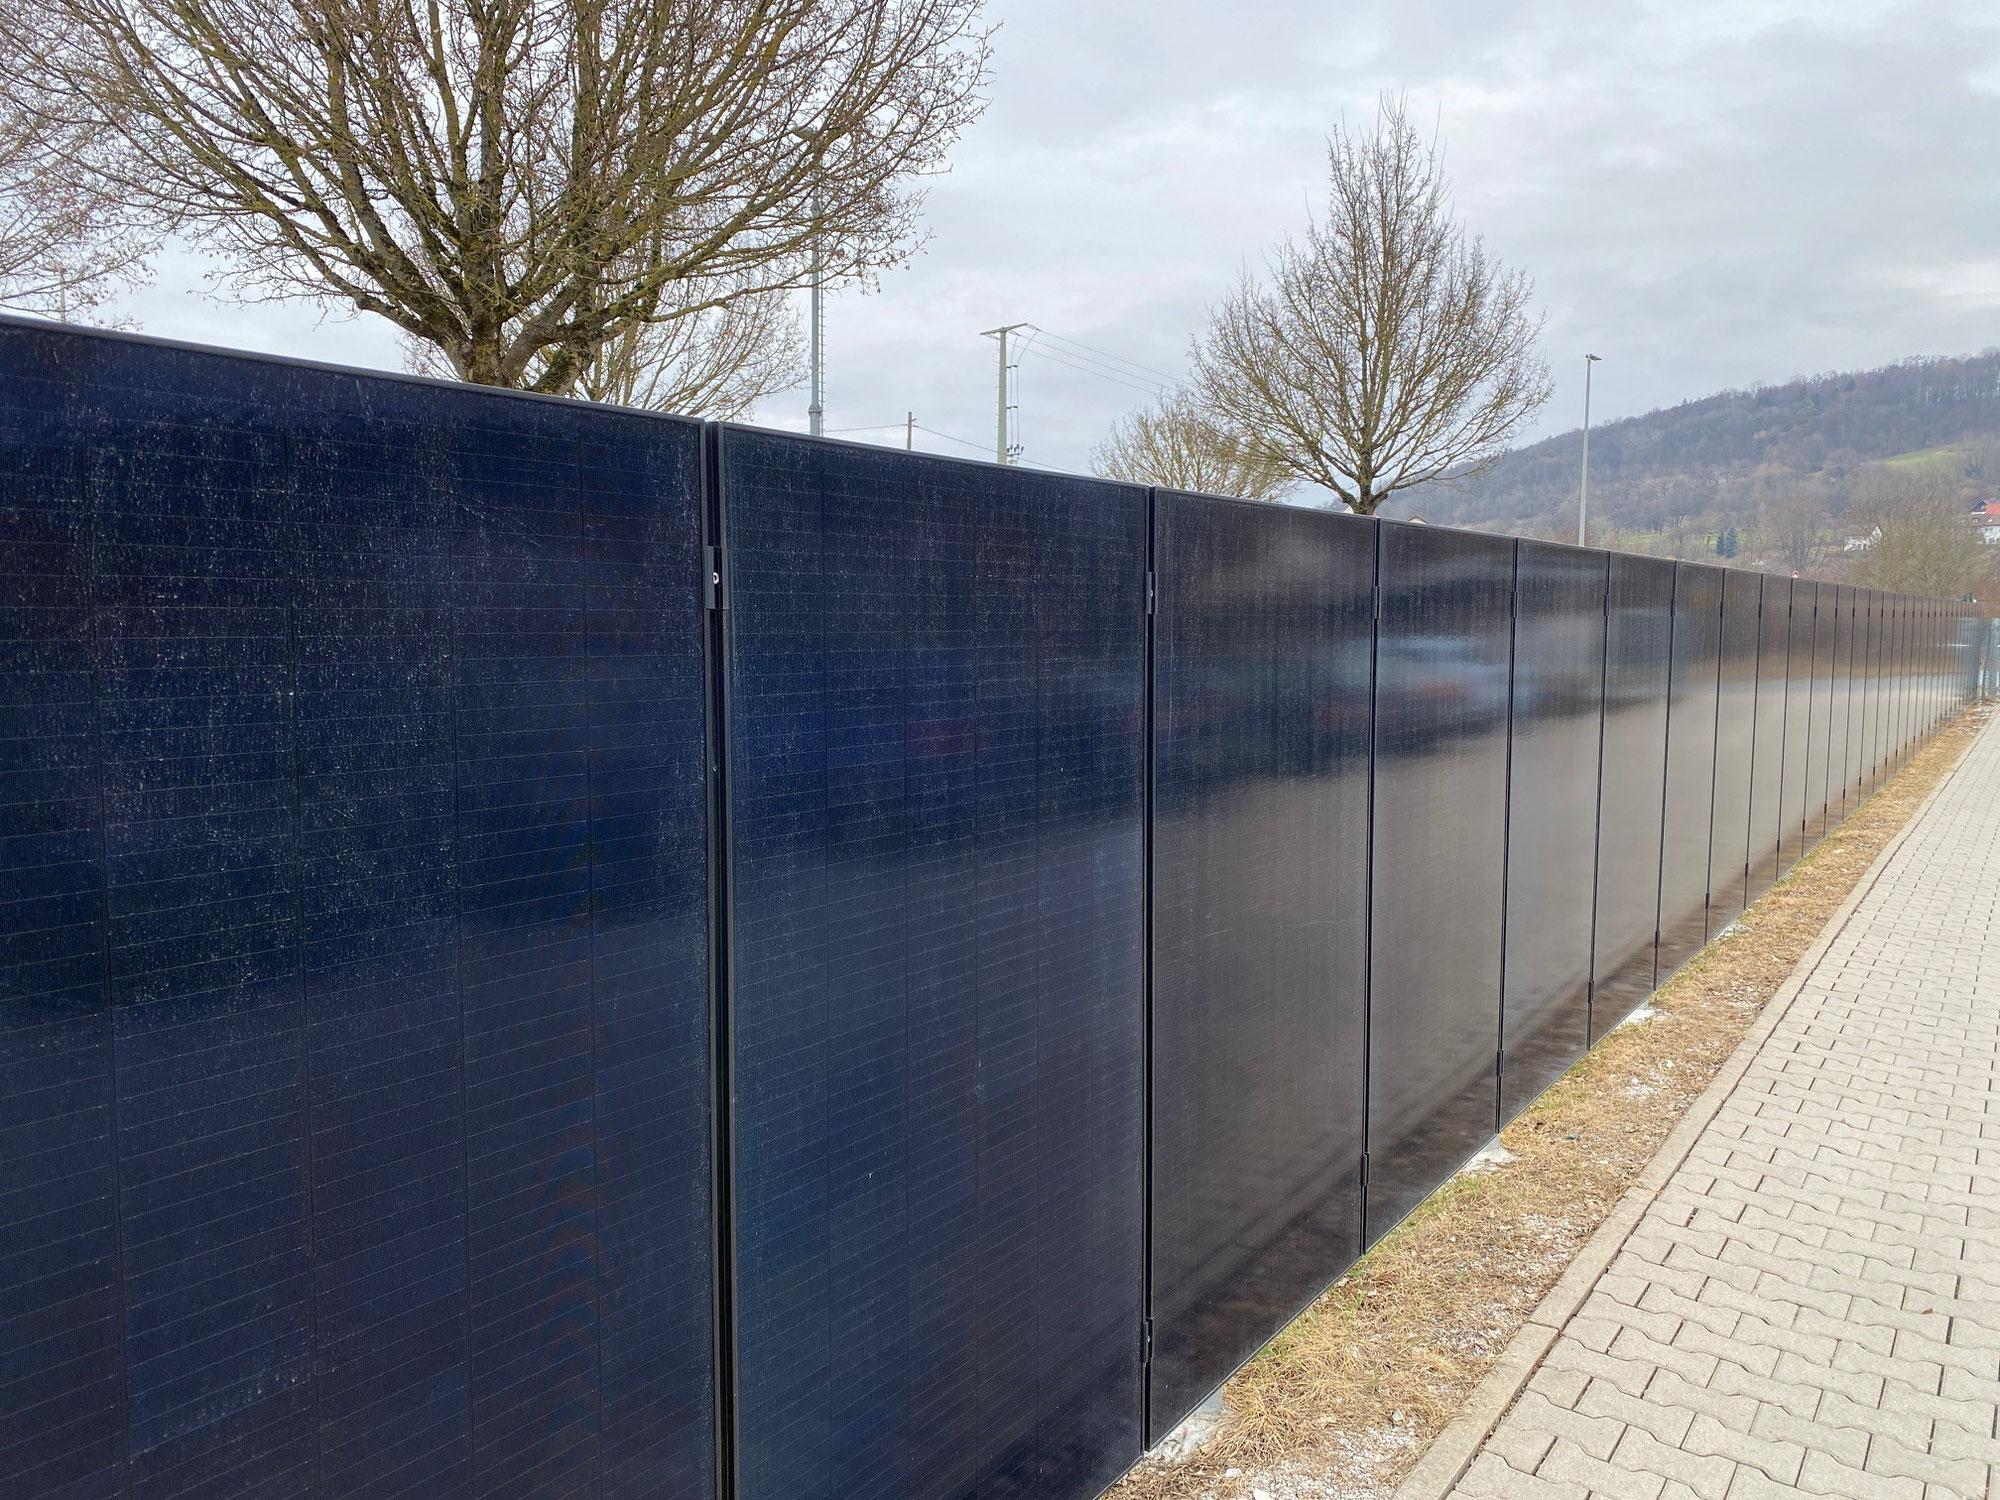 Solargarten- die Idee